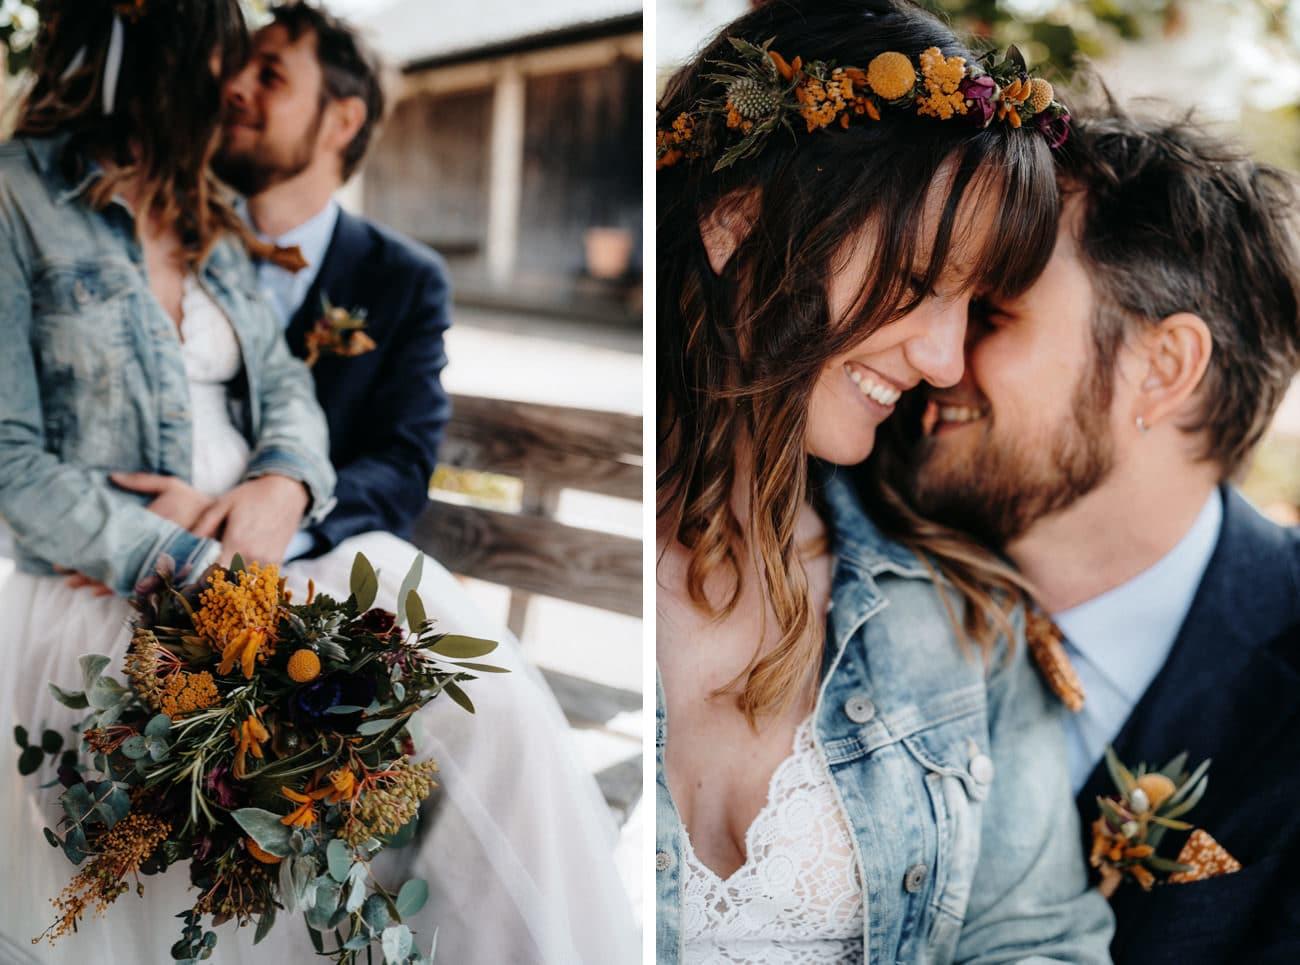 Hochzeit Alte Tenne Eder am Holz Moosinning Boho Hochzeitsfotograf